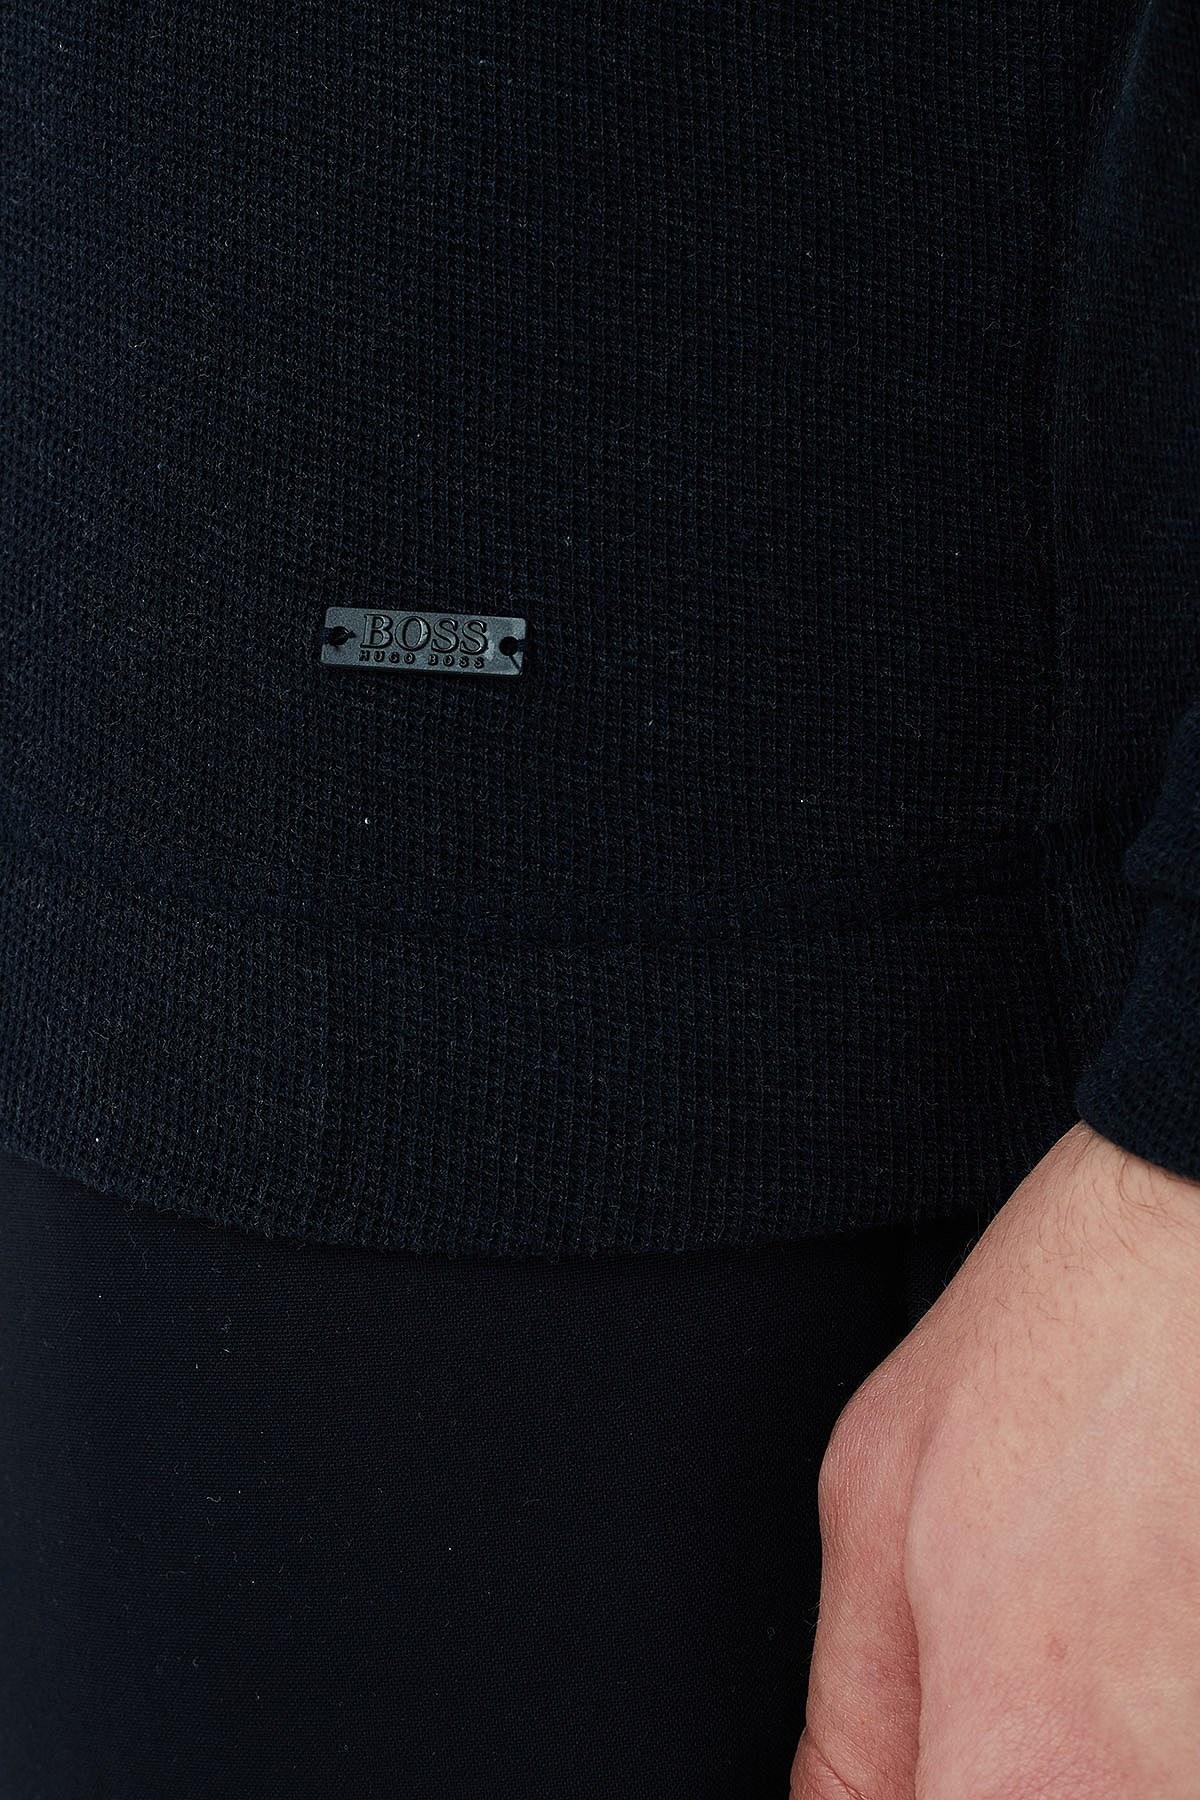 Hugo Boss Slim Fit Bisiklet Yaka % 100 Pamuk Erkek T Shirt 50401843 404 LACİVERT